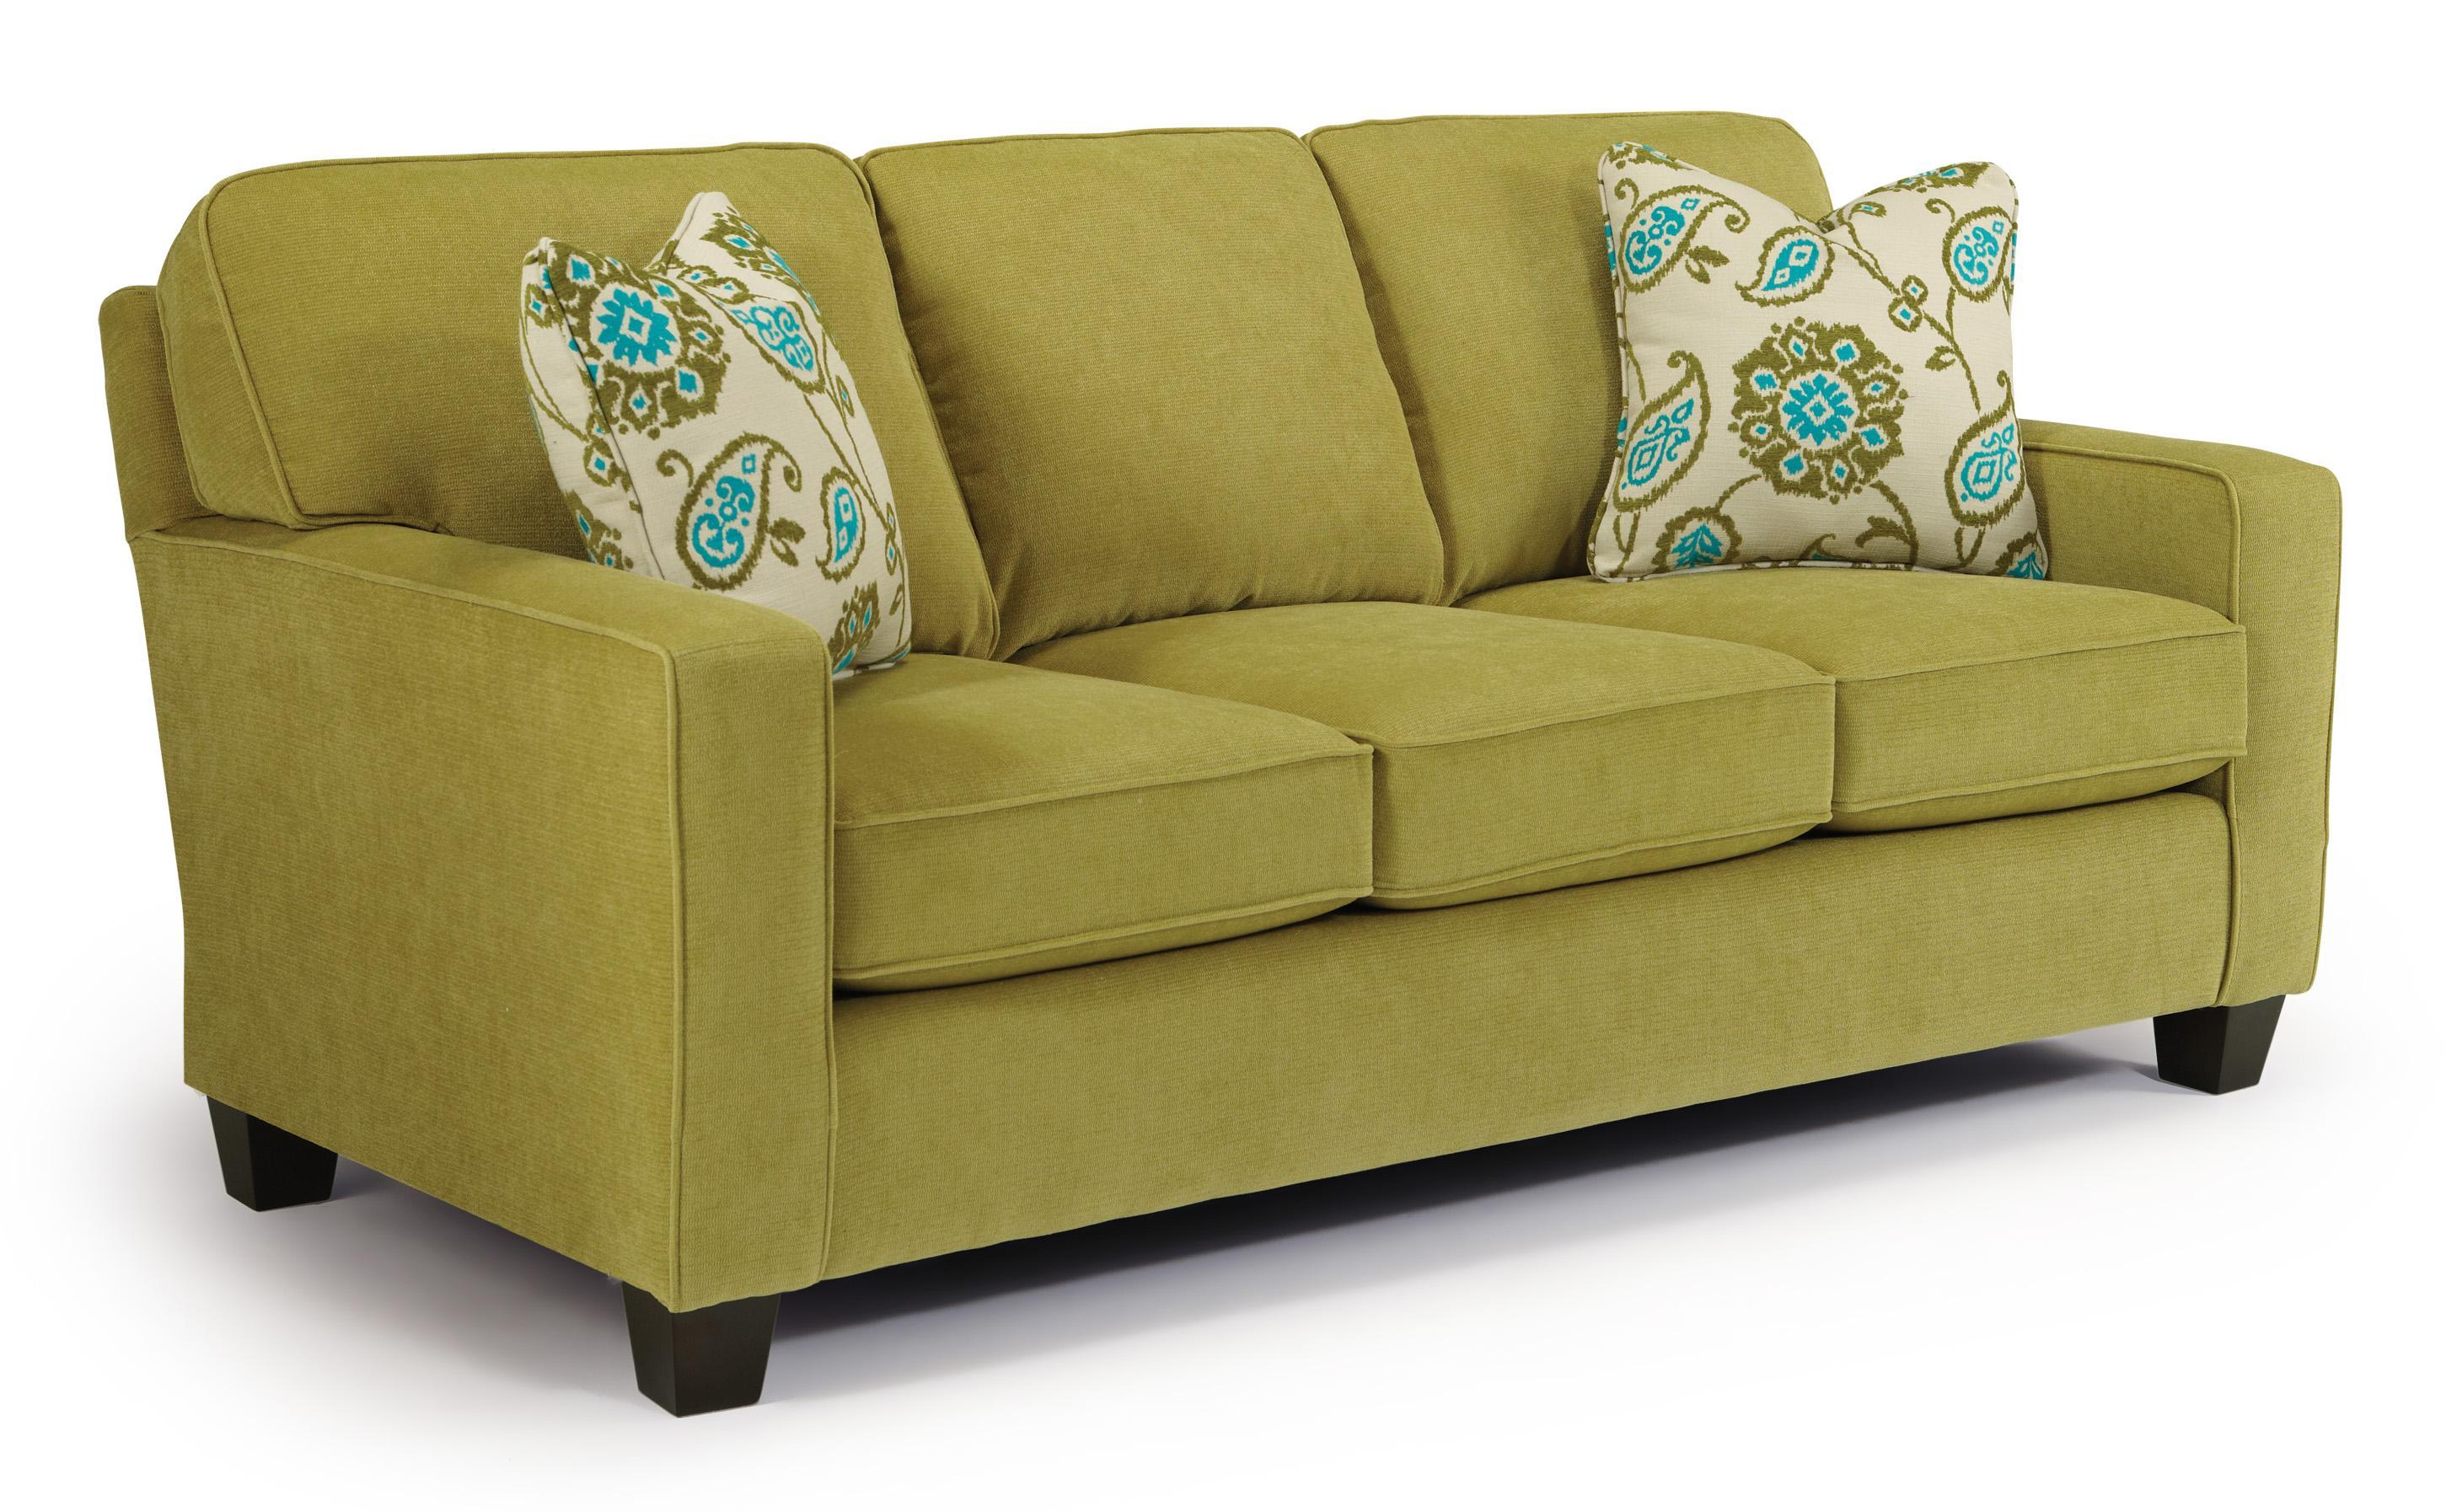 Best Home Furnishings Annabel U003cbu003eCustomizableu003c/bu003e Contemporary Sofa With  Track